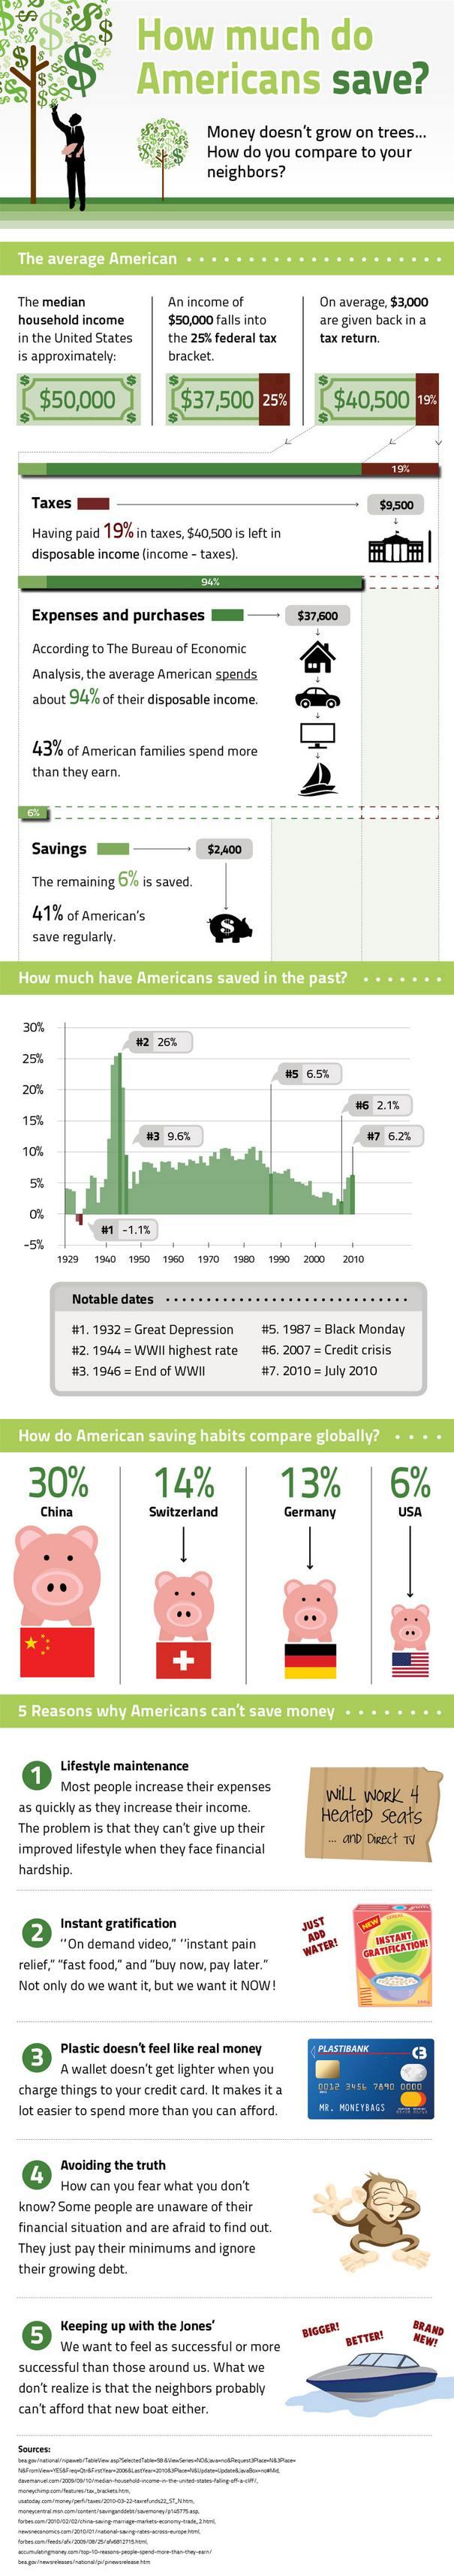 Retirement-Savings-Statistics